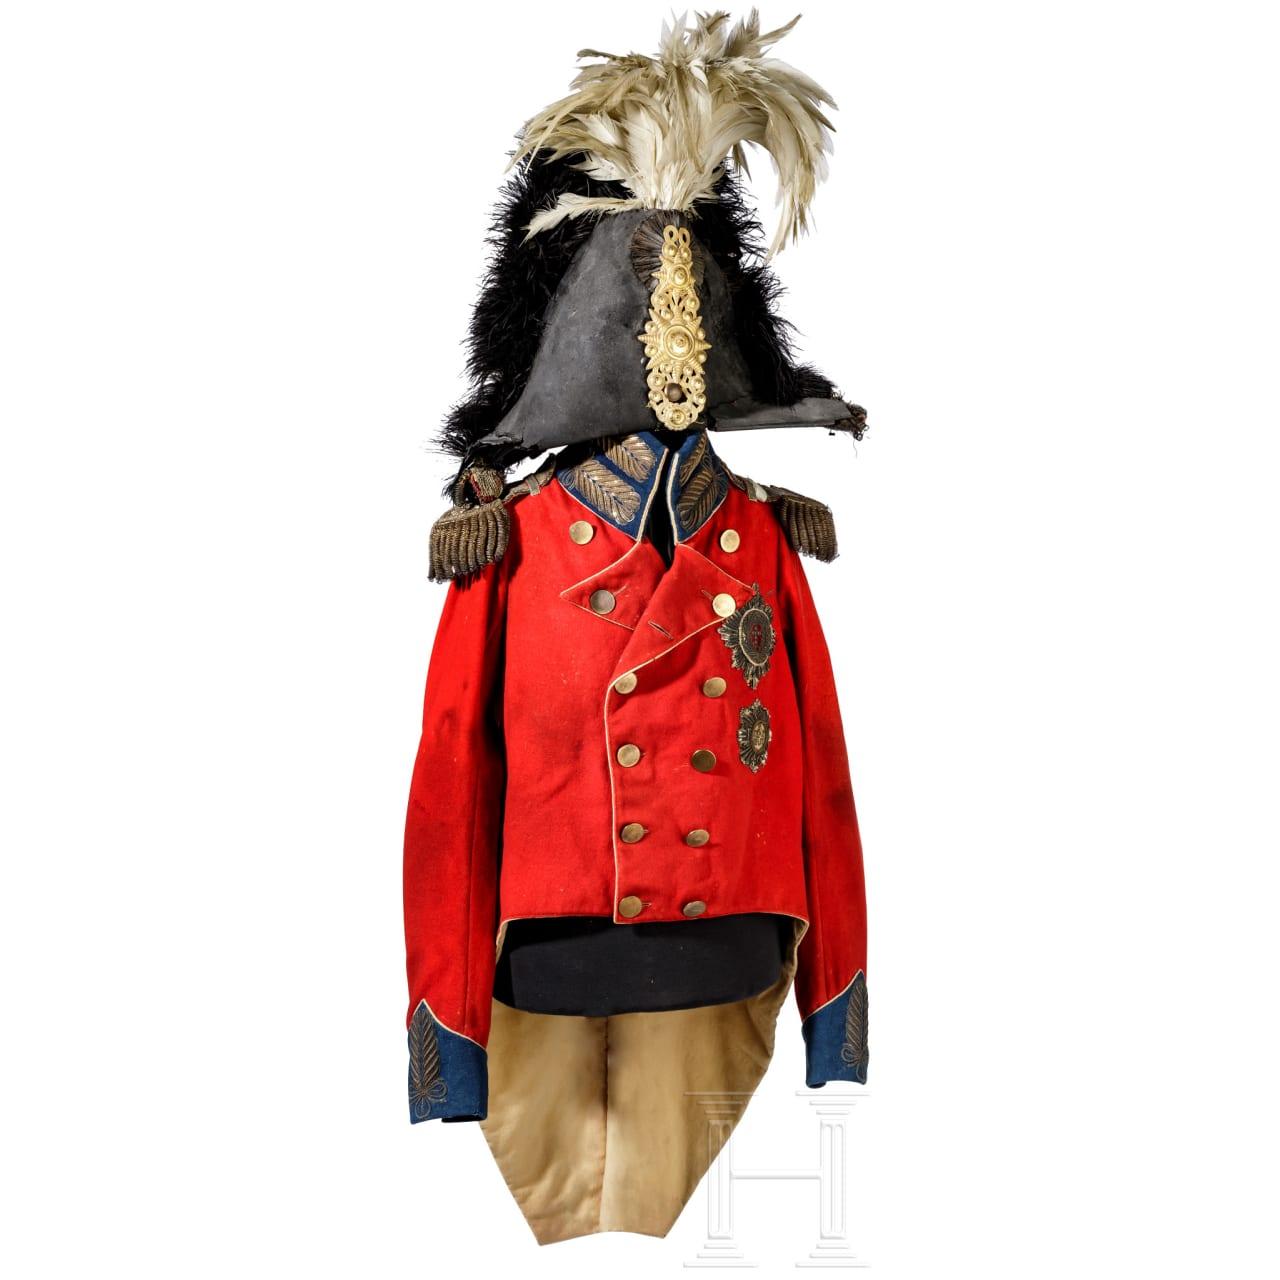 King Frederick VI of Denmark, Duke of Saxe-Lauenburg (1768 - 1839) – a general's uniform, circa 1814/20